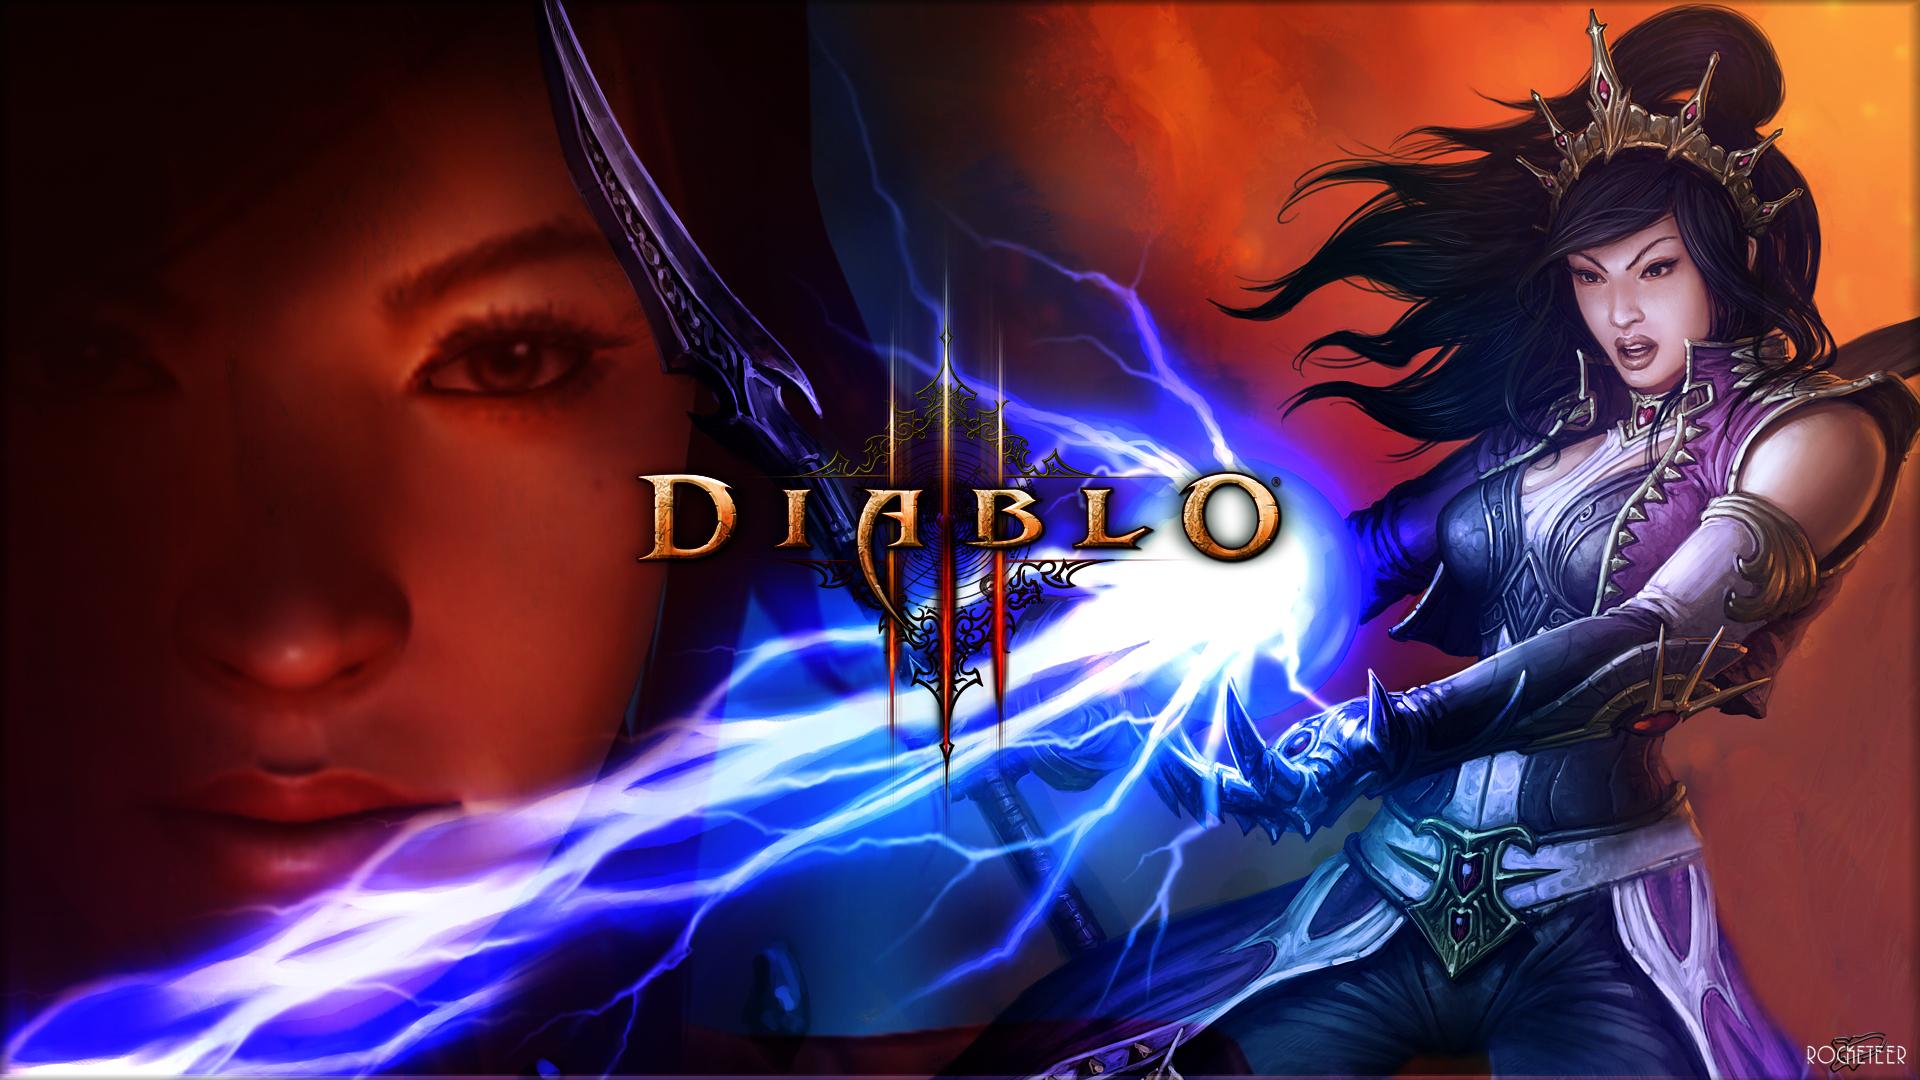 Diablo Iii Hd Wallpaper Background Image 1920x1080 Id